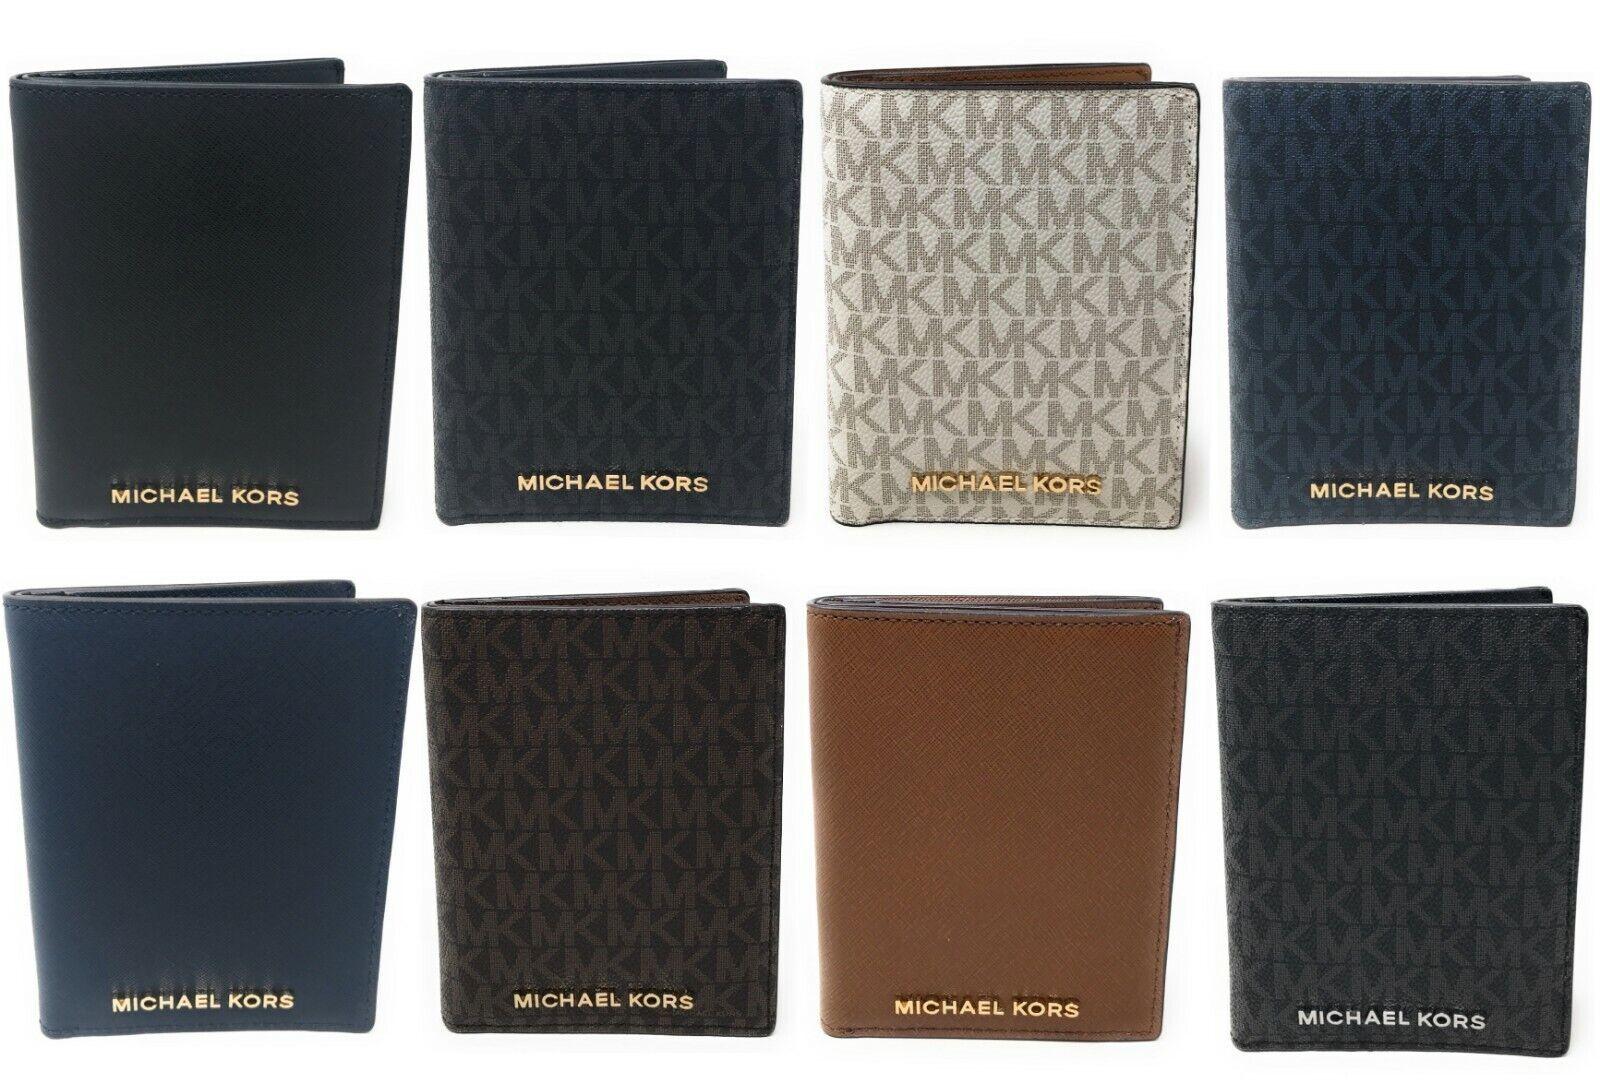 michael-kors-jet-set-travel-passport-case-leather-signature-wallet-credit-card